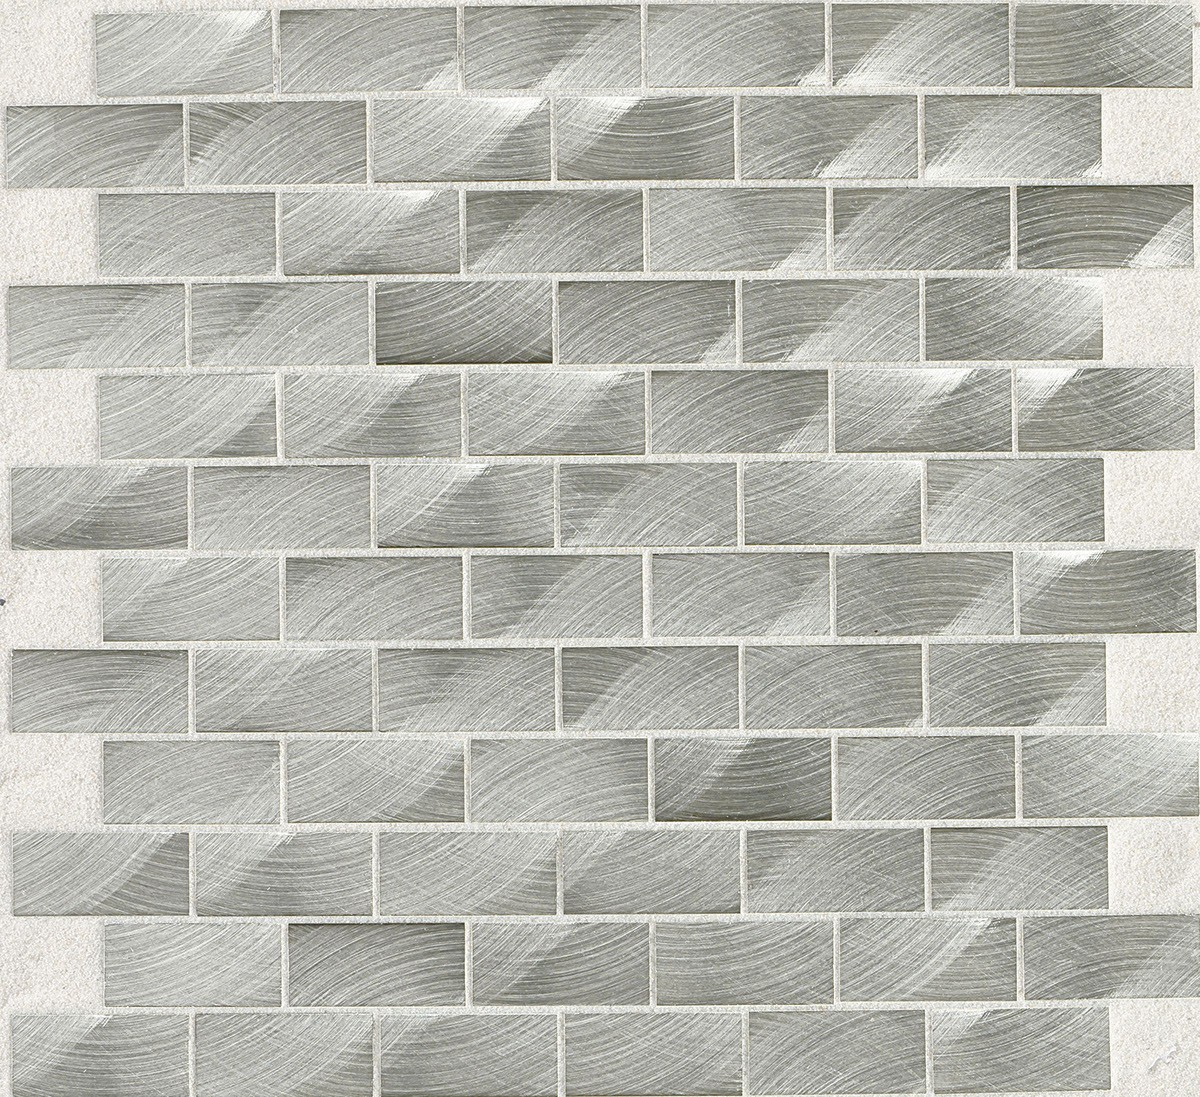 ST70 Steel Mosaic brick joint